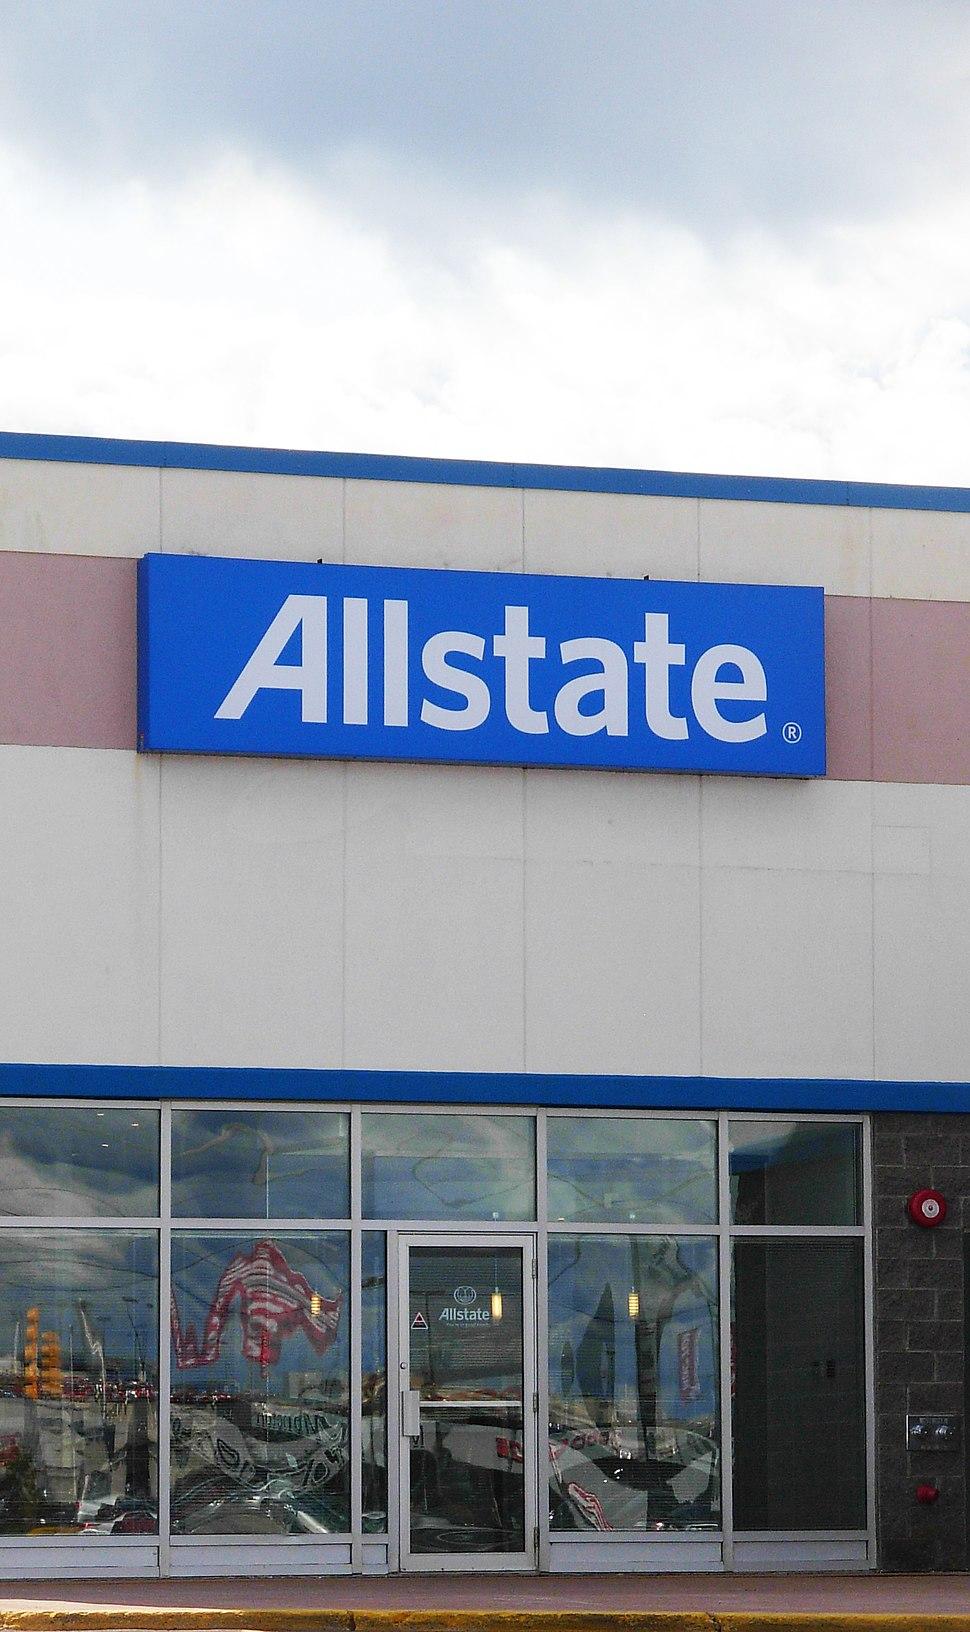 Allstate store